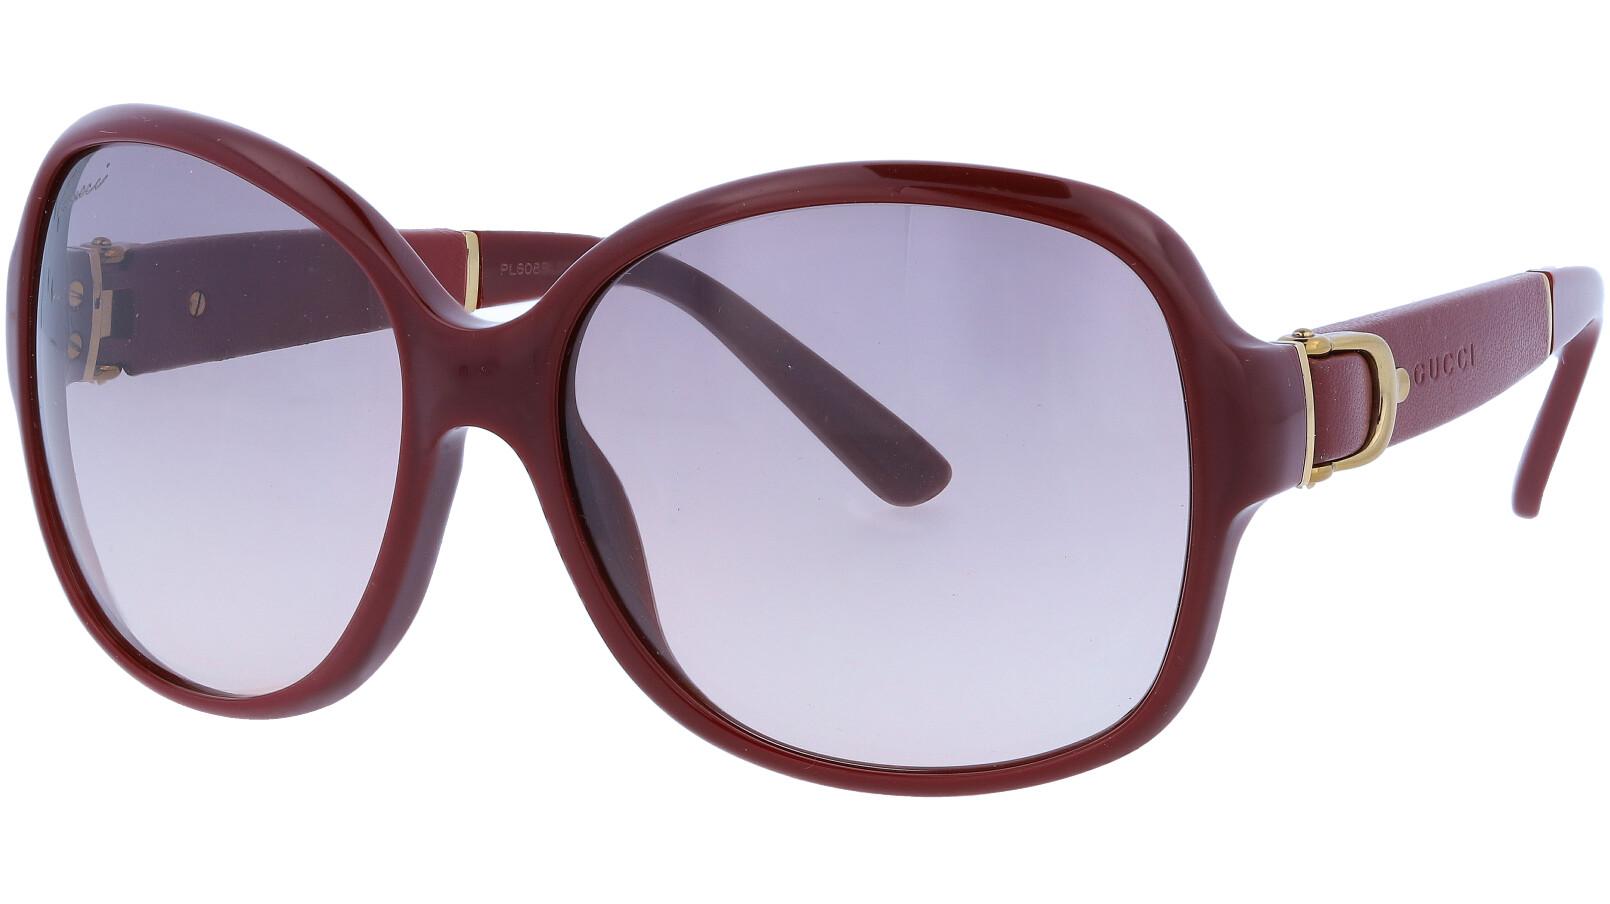 GUCCI GG3638S 0XKPG 58 OPLBURG Sunglasses